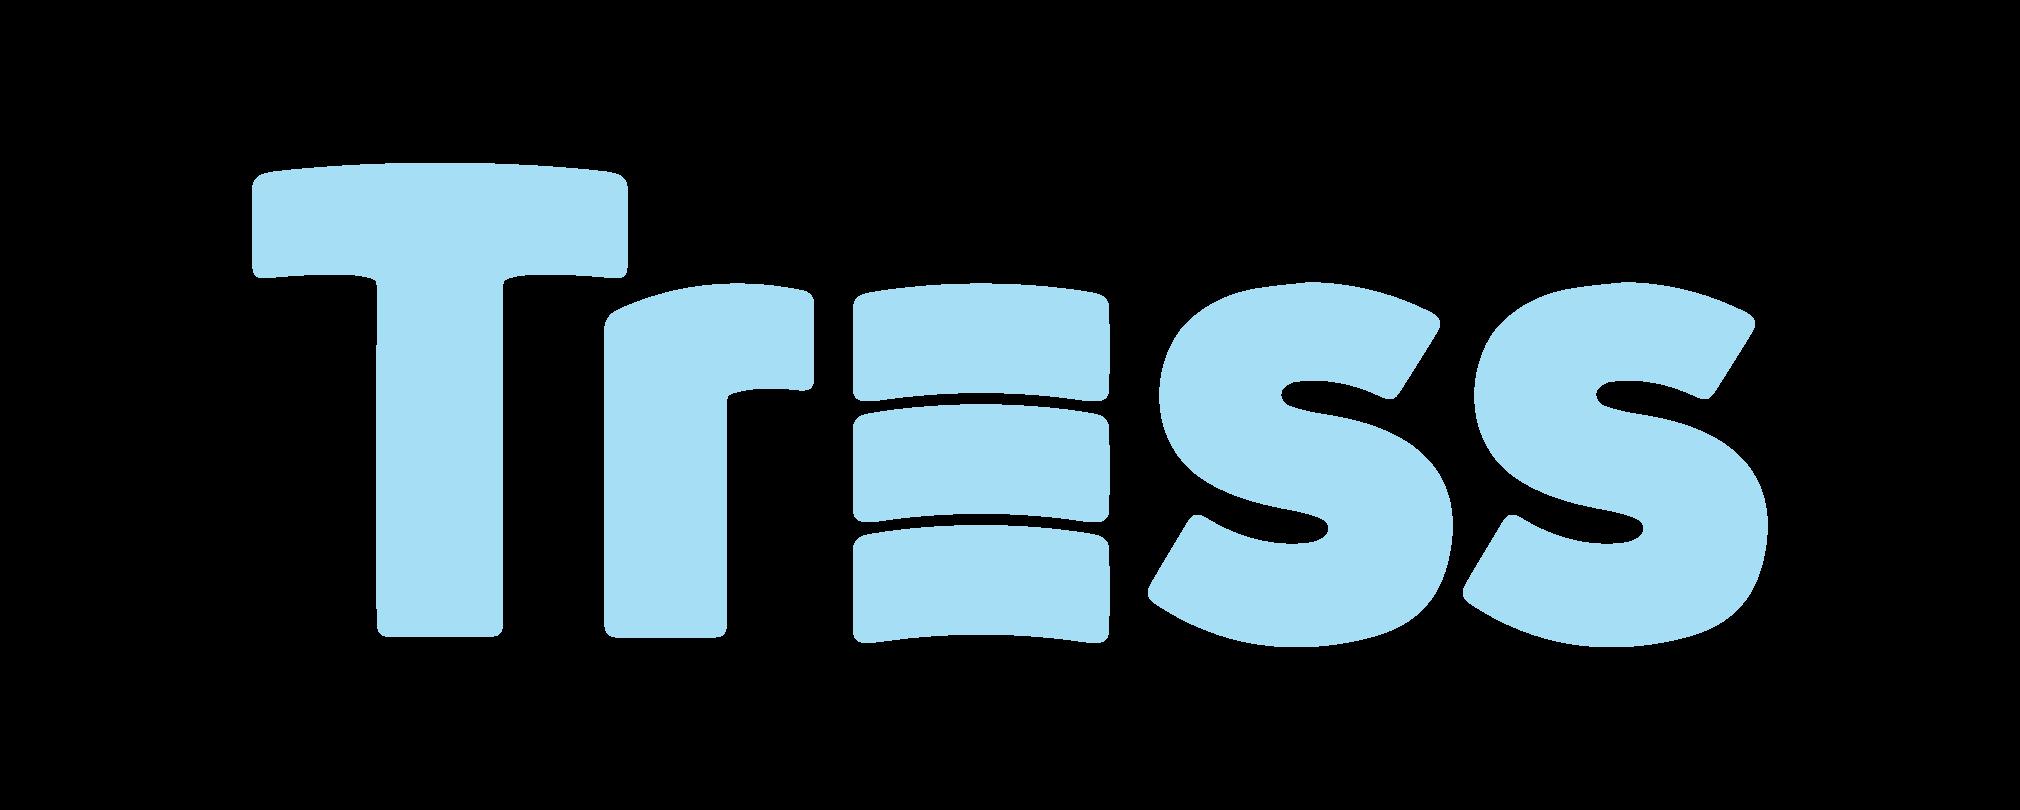 Tress_logo.png